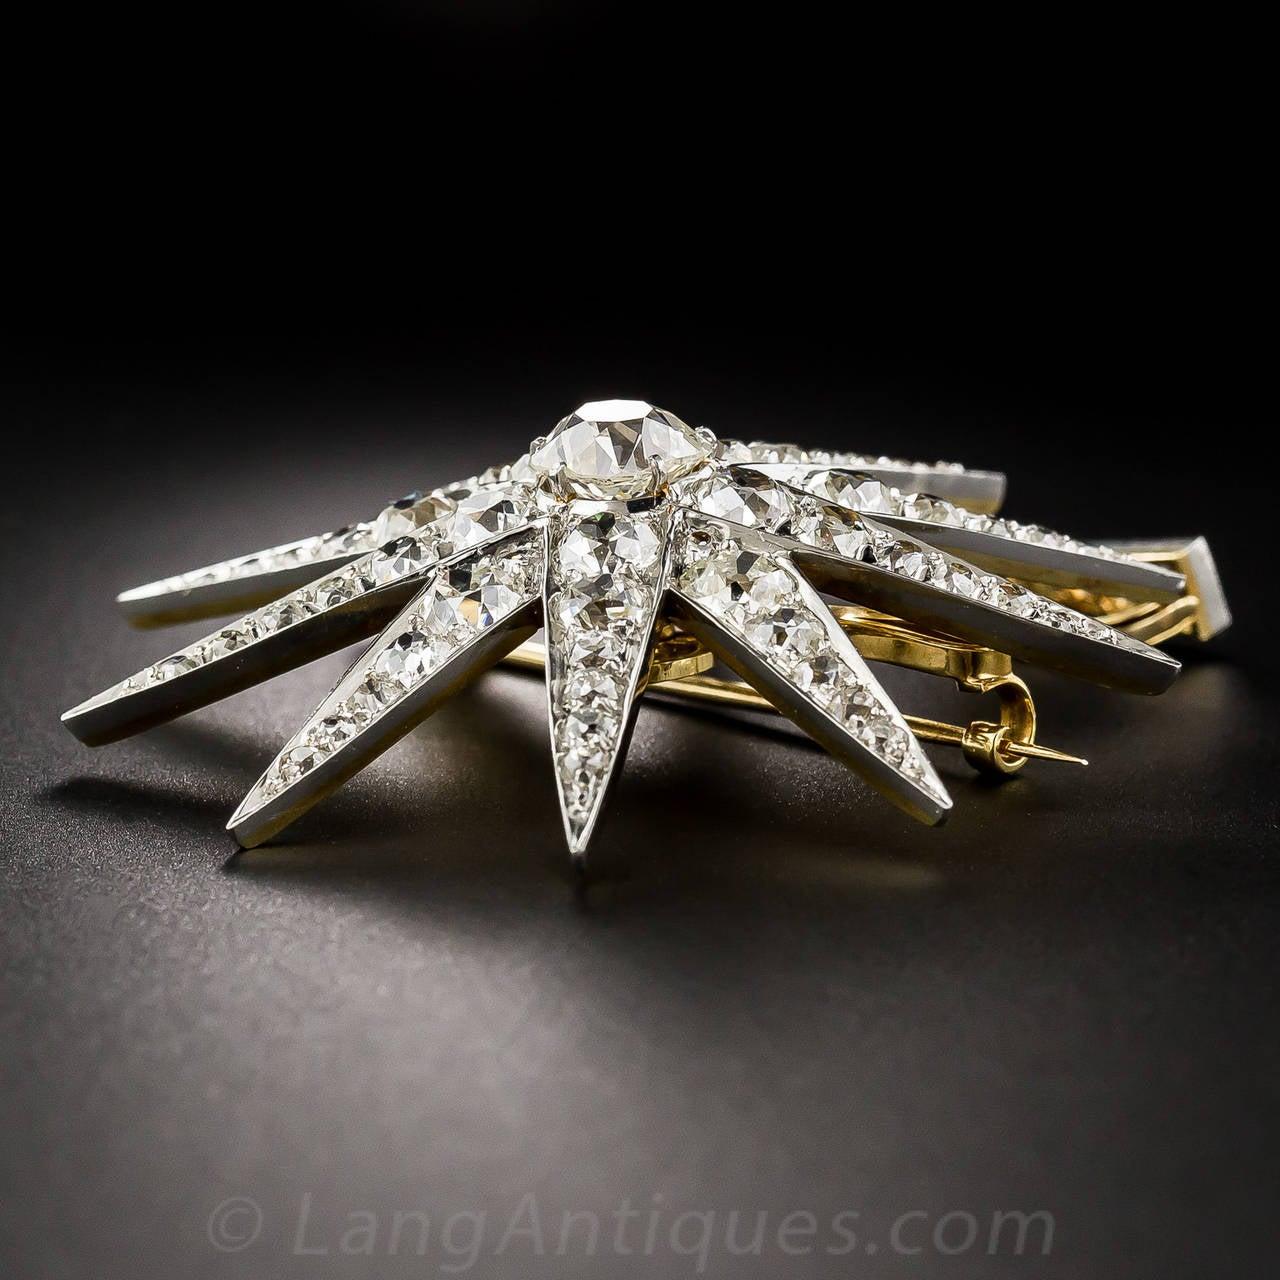 Victorian 2.13 Carat Cushion Cut Diamond Platinum Star Brooch Pendant - GIA Cert For Sale 2